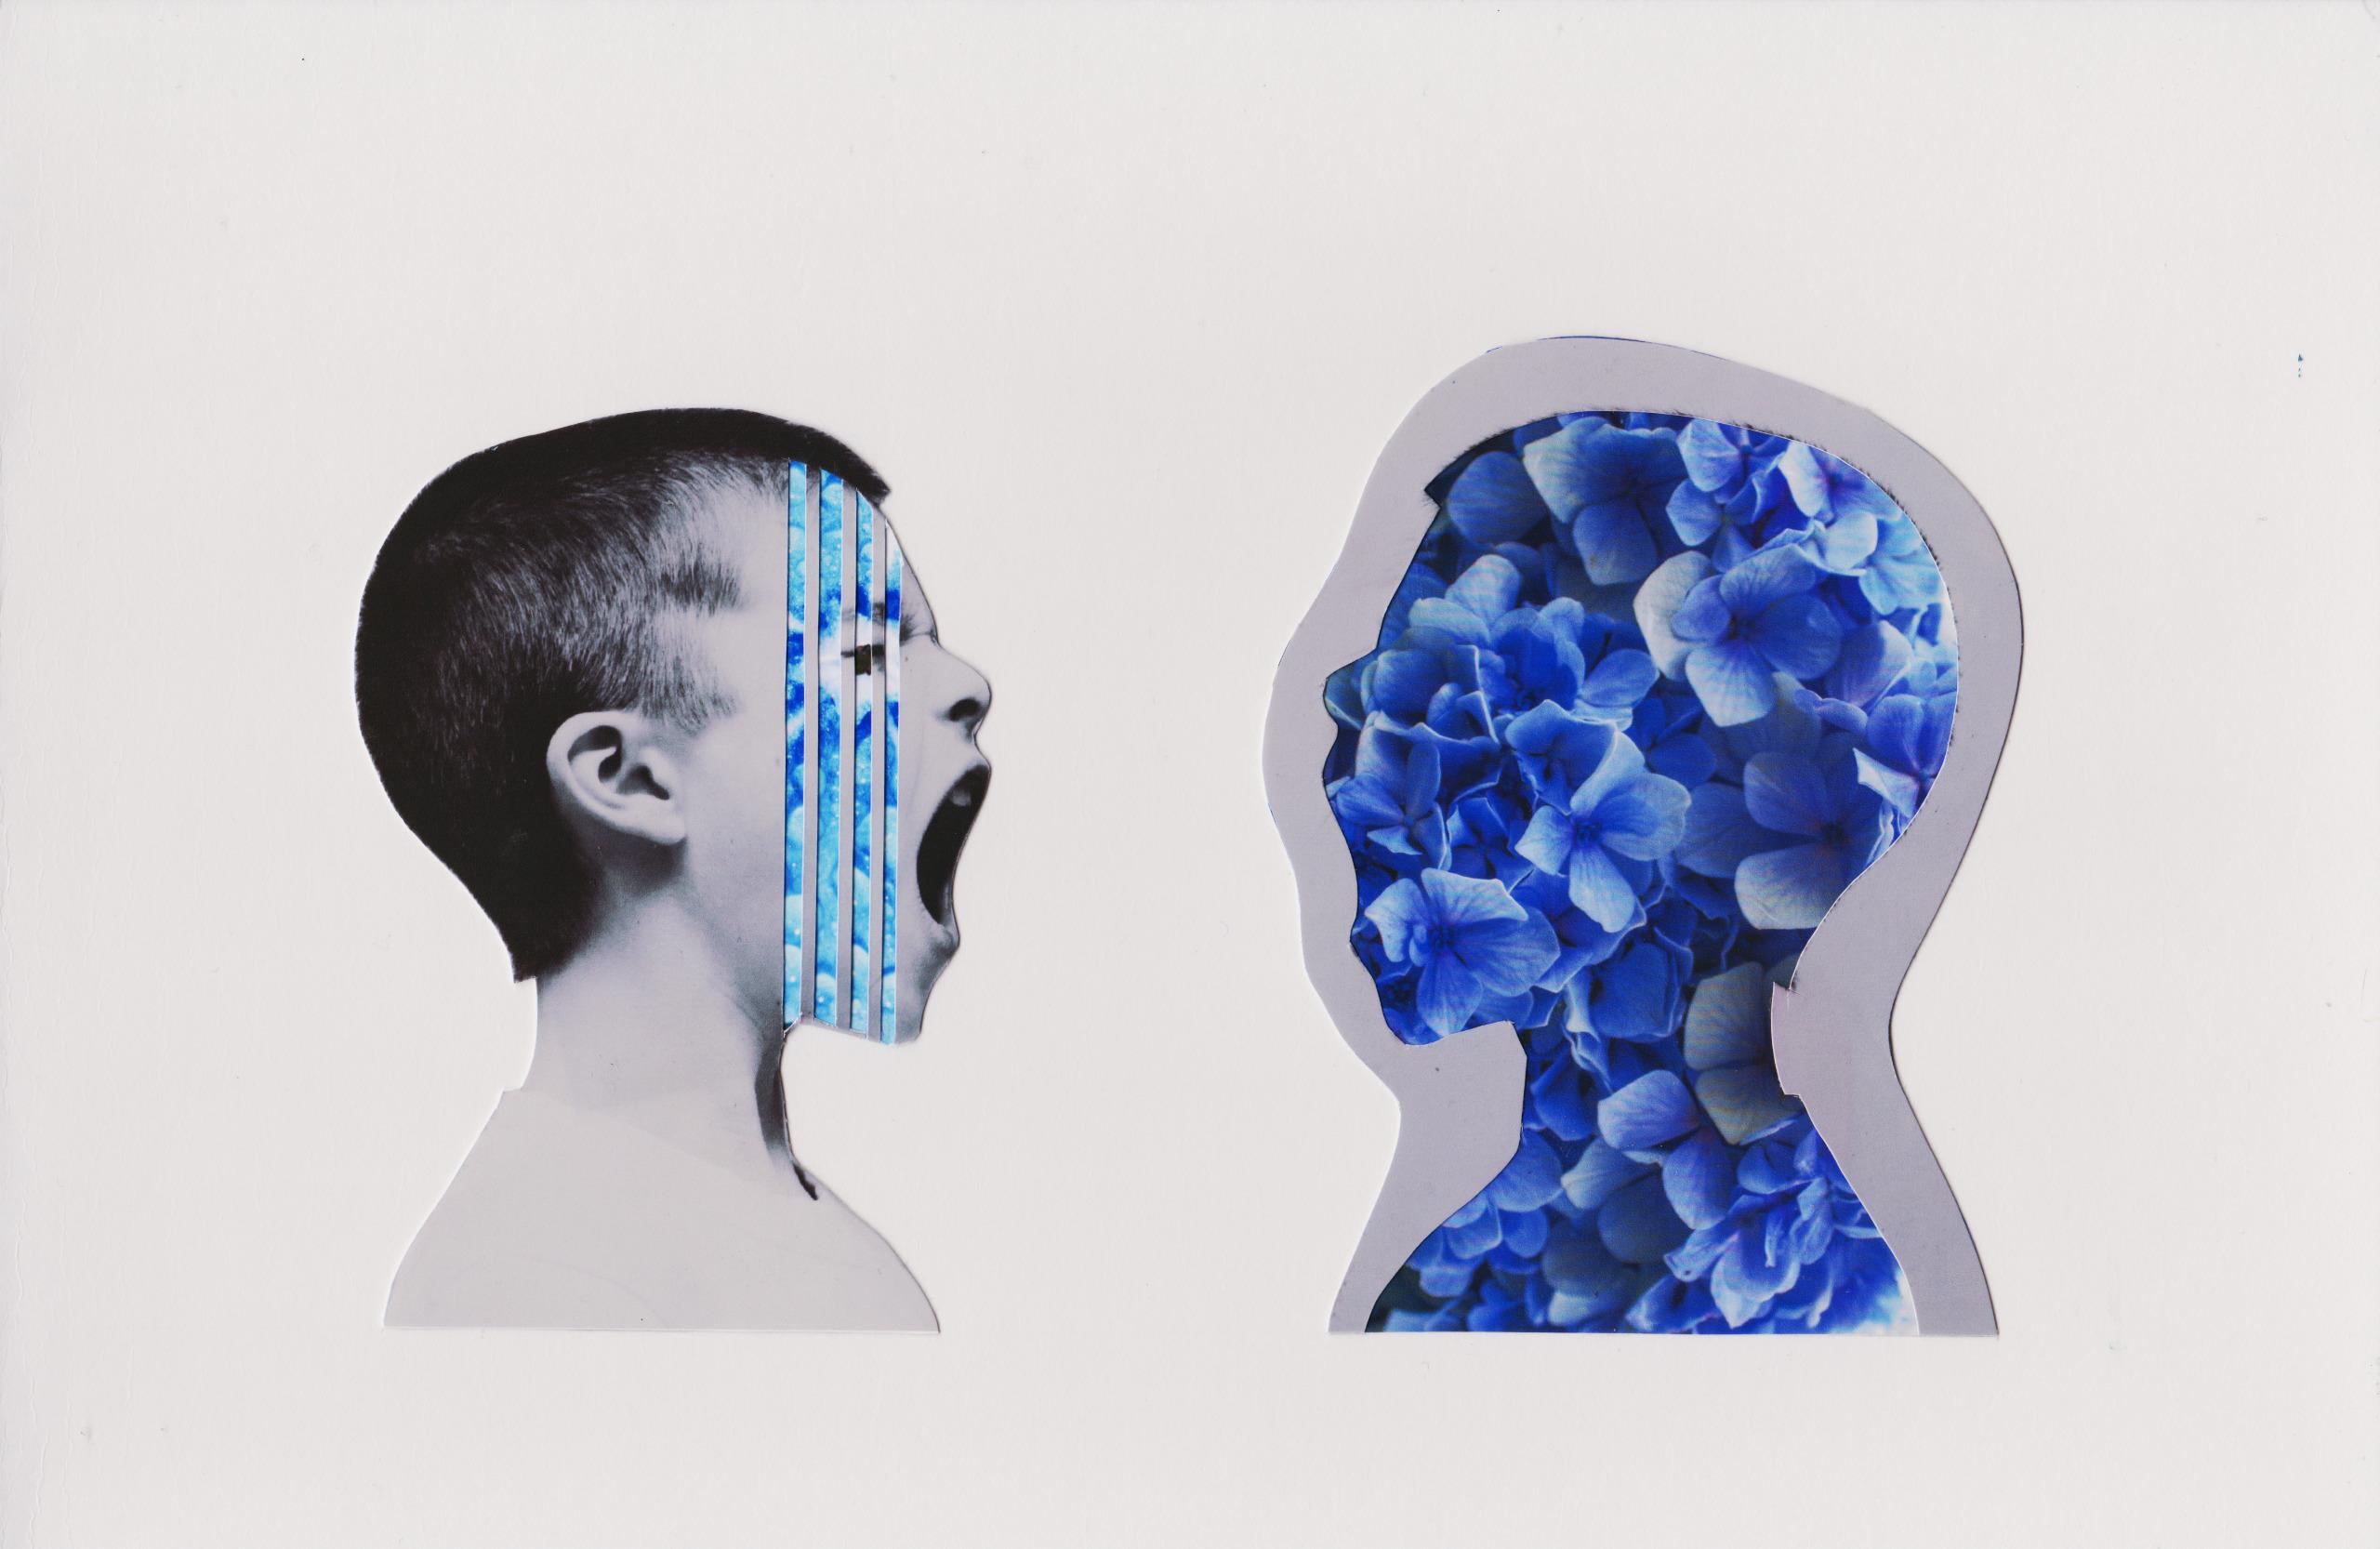 Reflexo - Collage, Analogue, Colagem - marianabastoscollage | ello